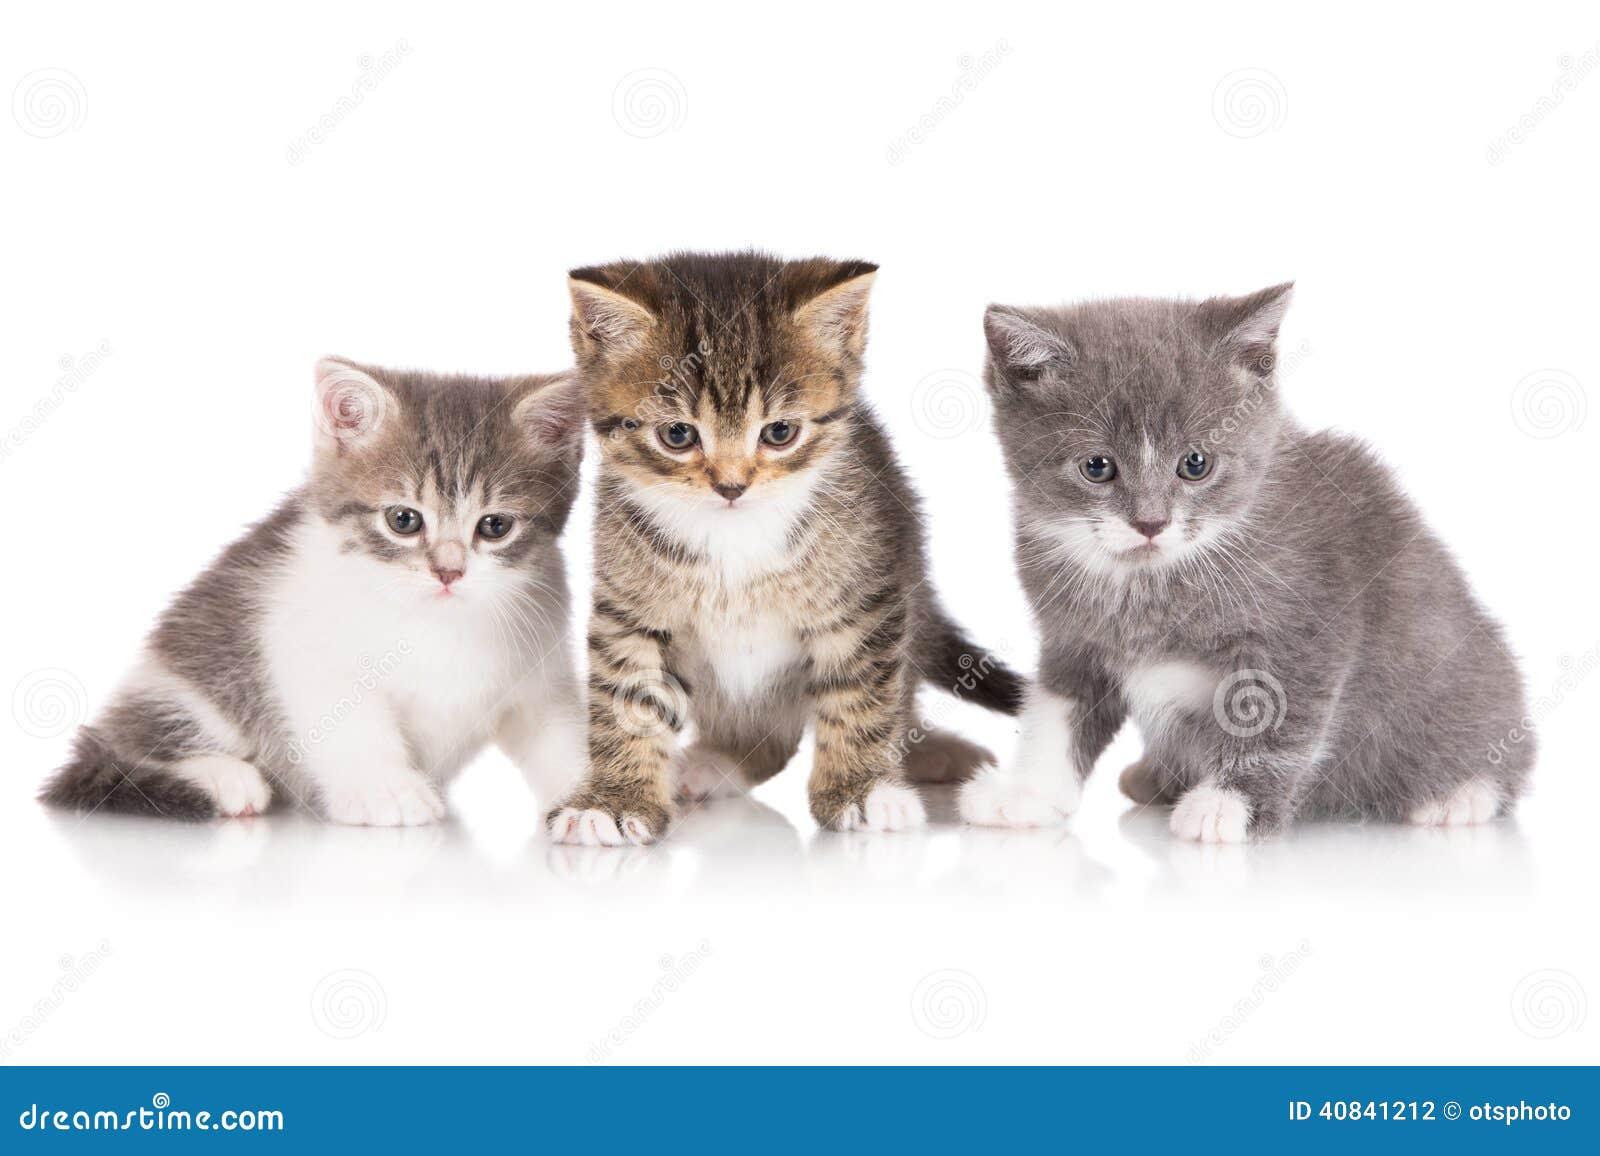 Three adorable kittens